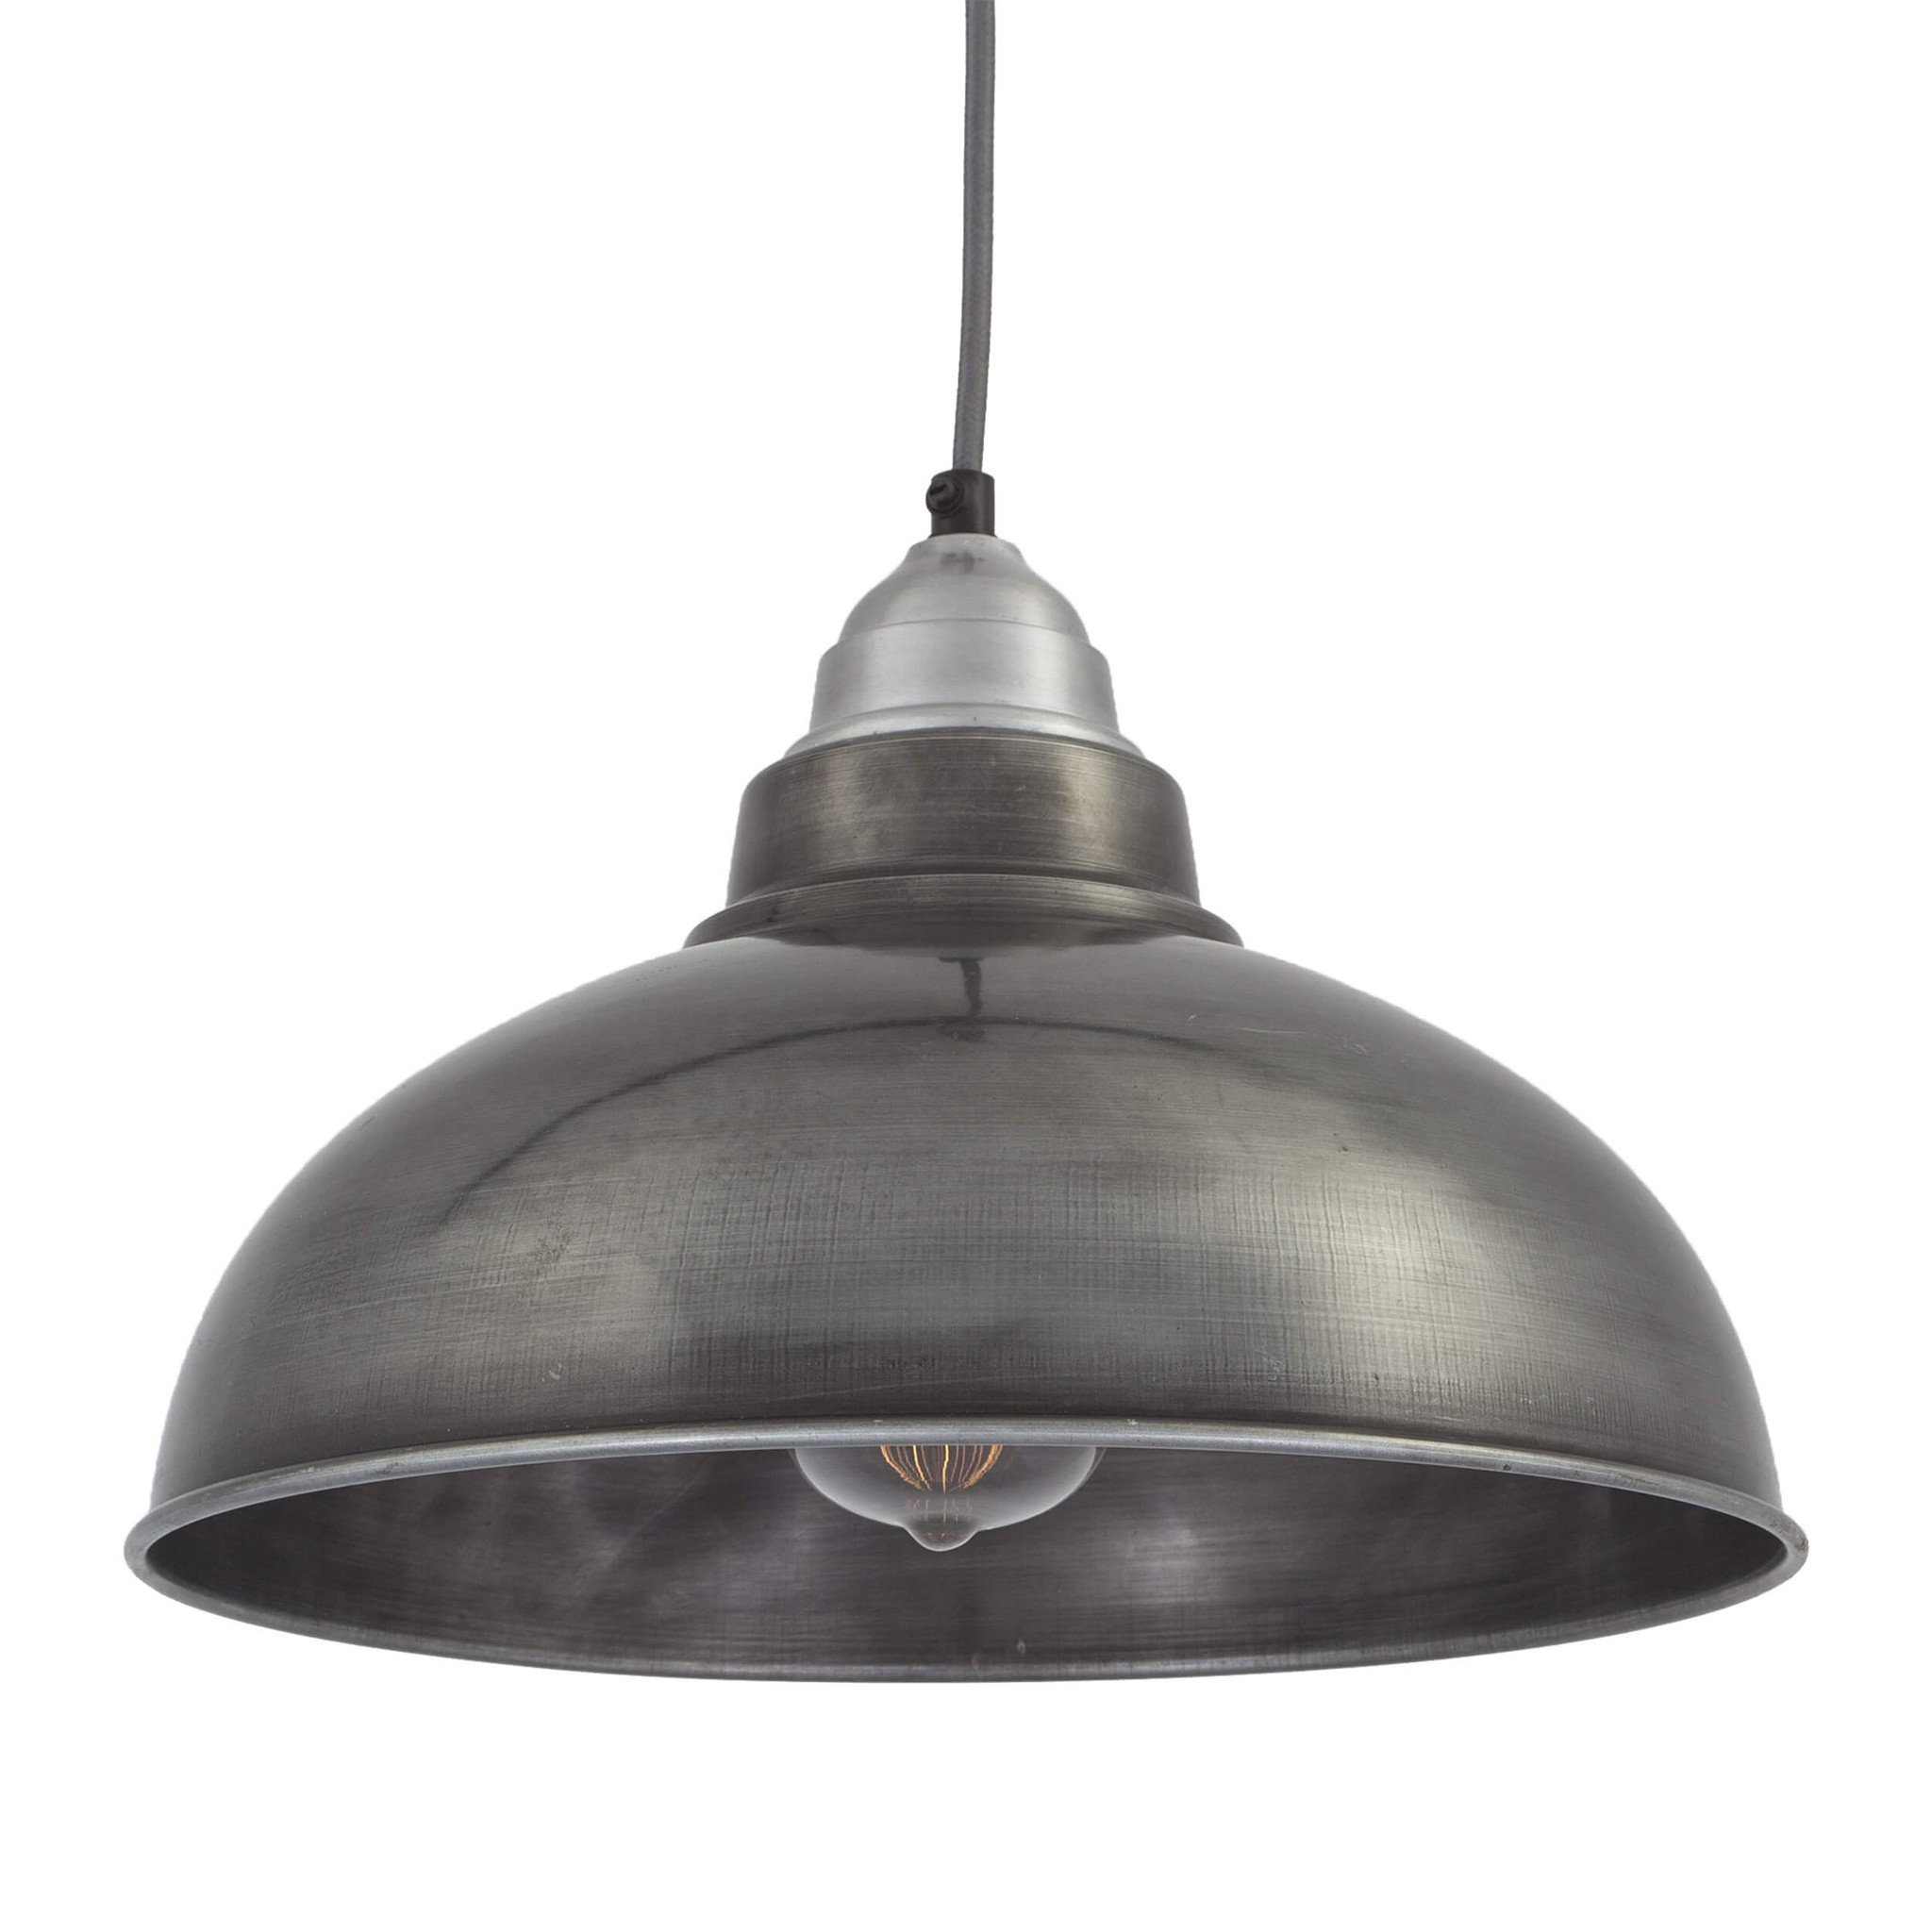 Industville Old Factory Vintage Pendant Light - Dark Pewter - 12 ...